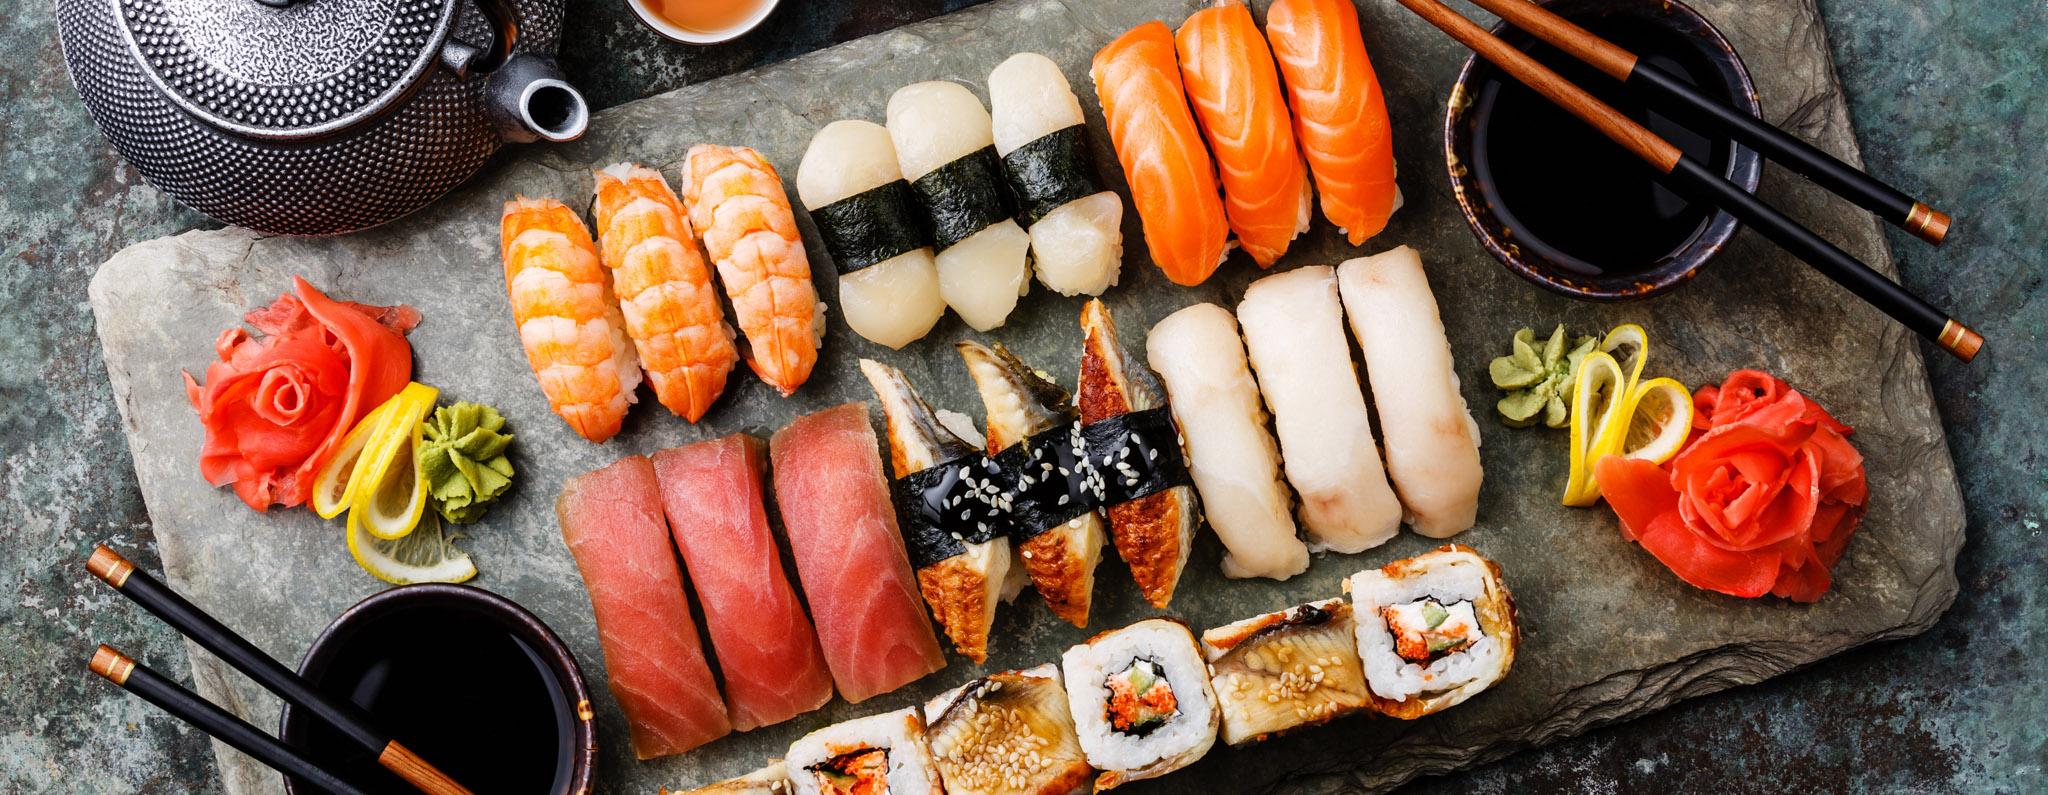 Bilder VU Header Photography 05 Restaurant - Sushi